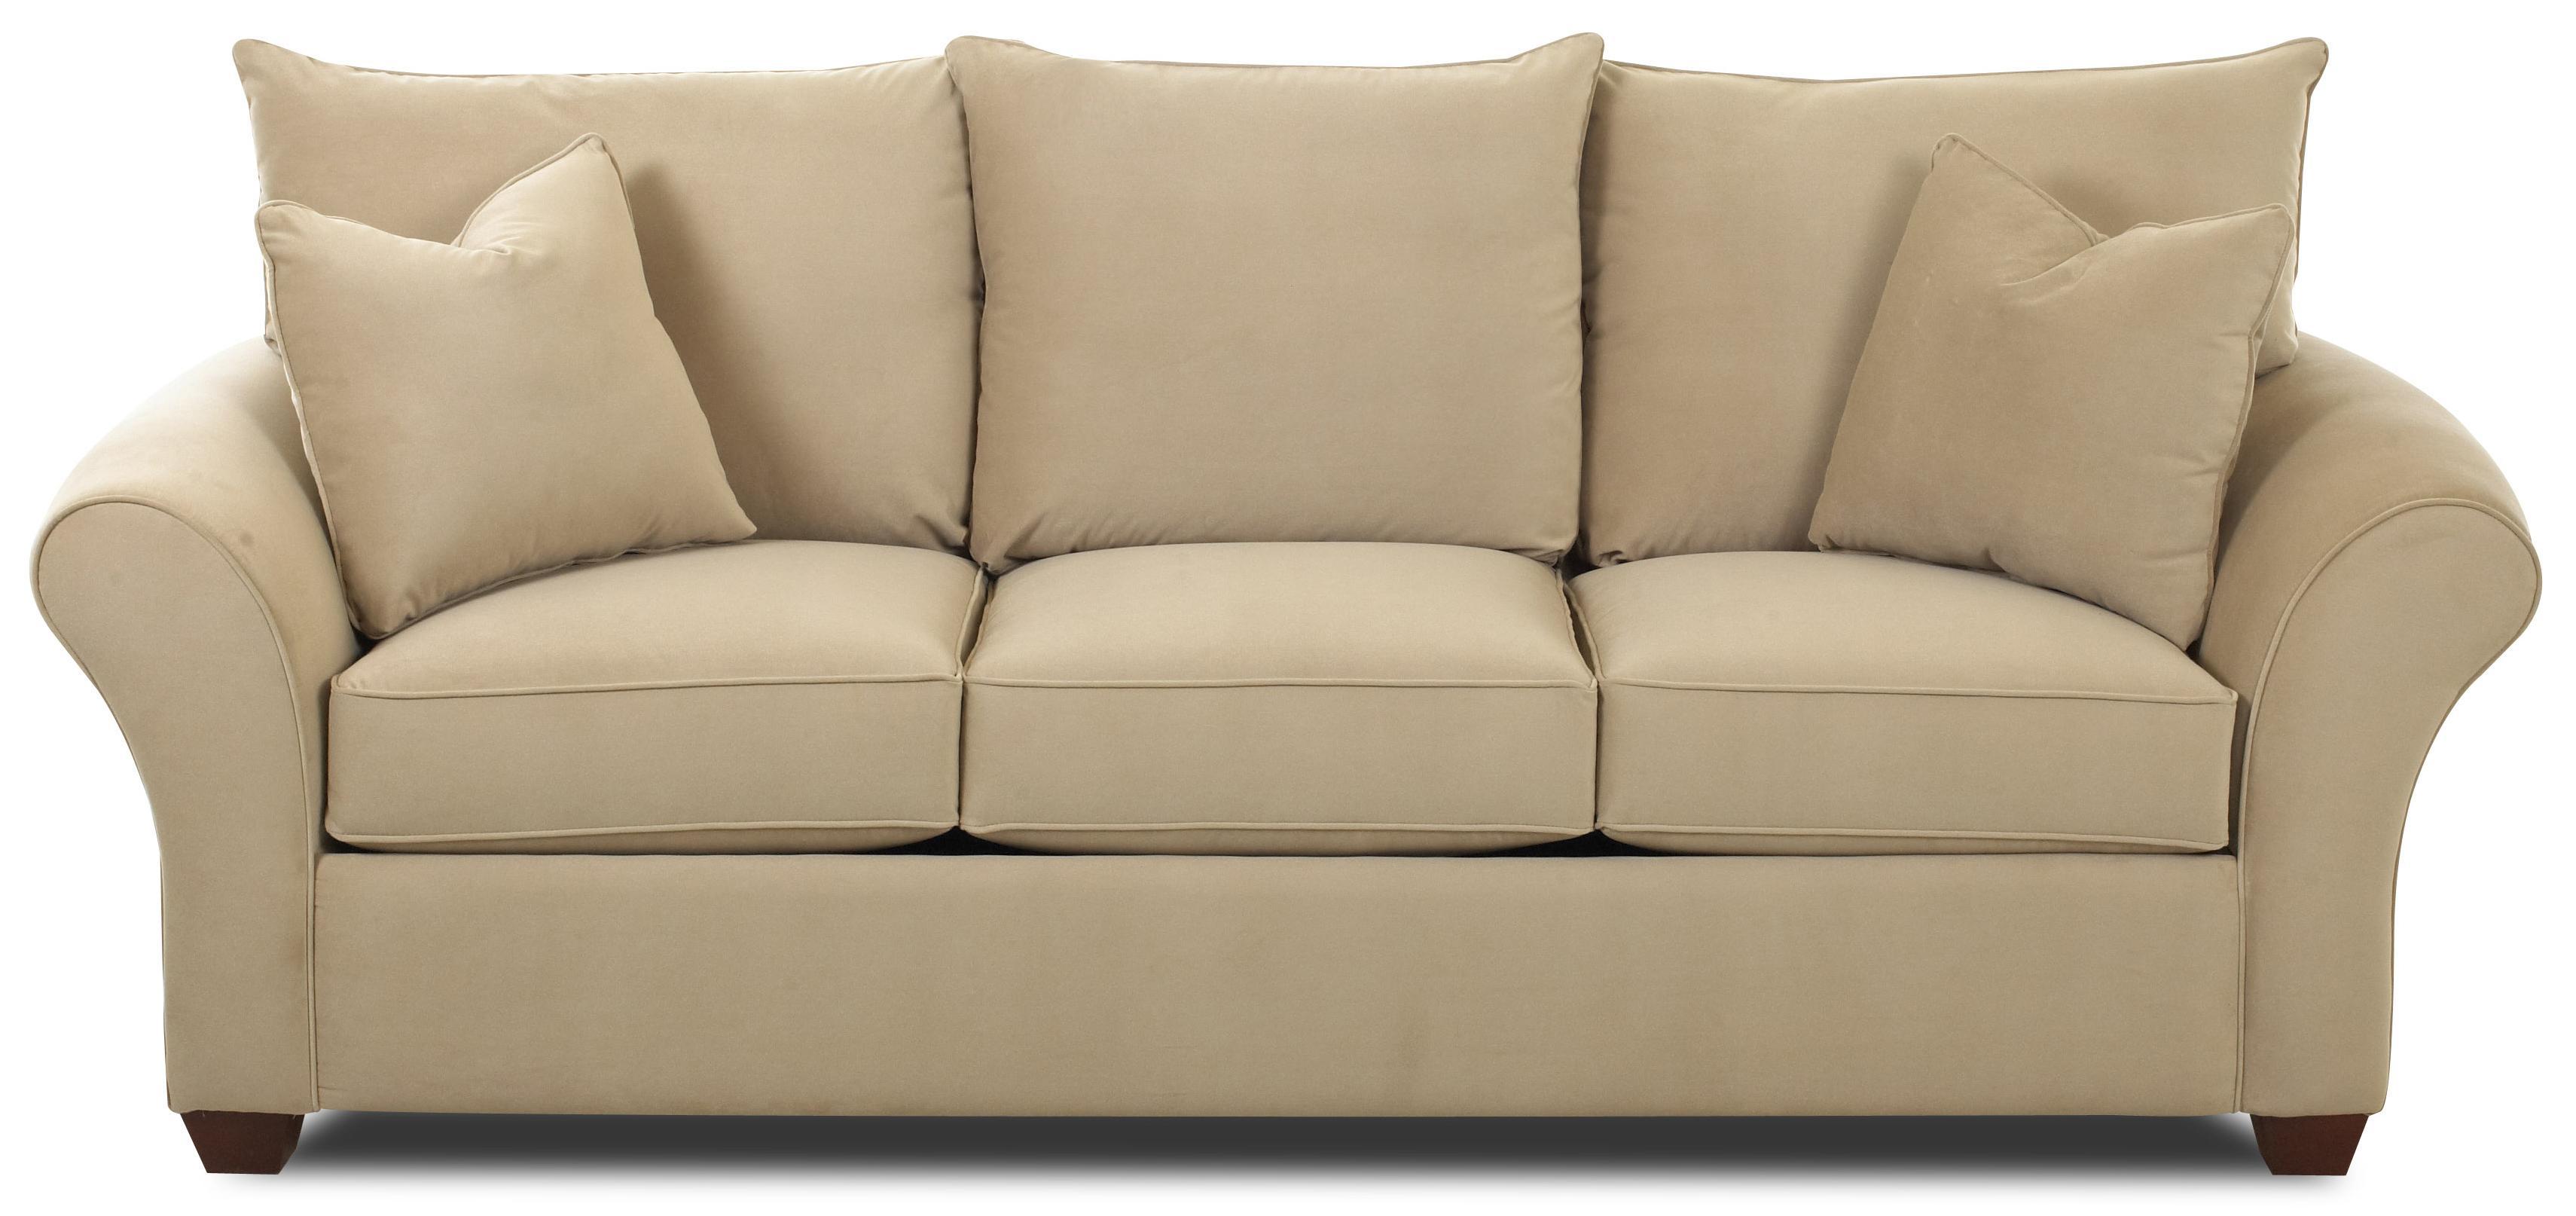 Home Decor Furniture Outlet